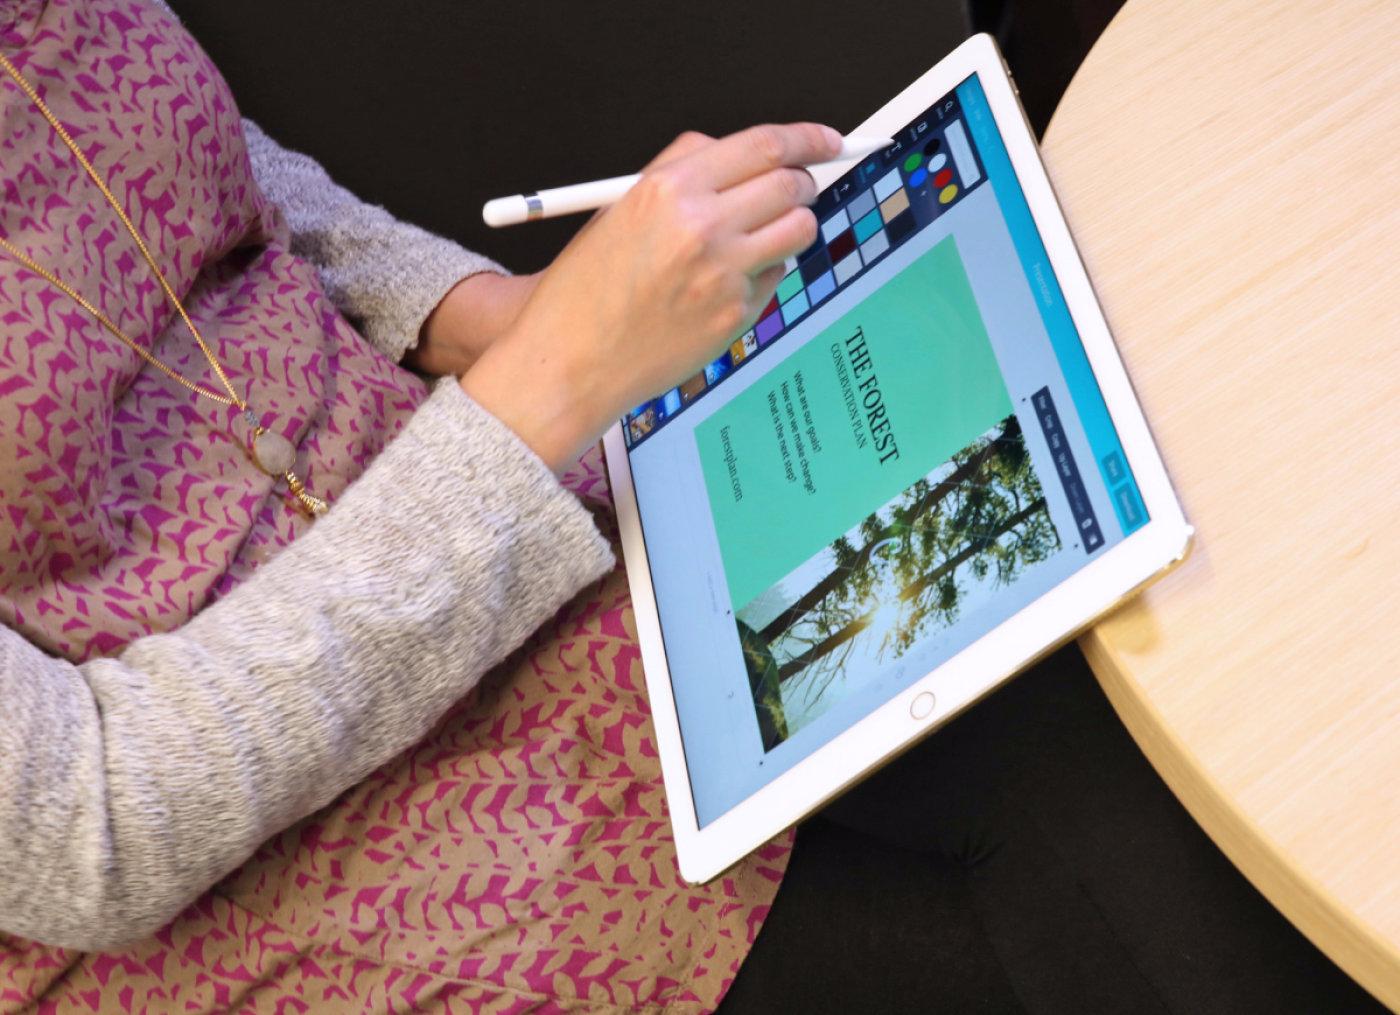 iPad Pro mic 9,7 inci